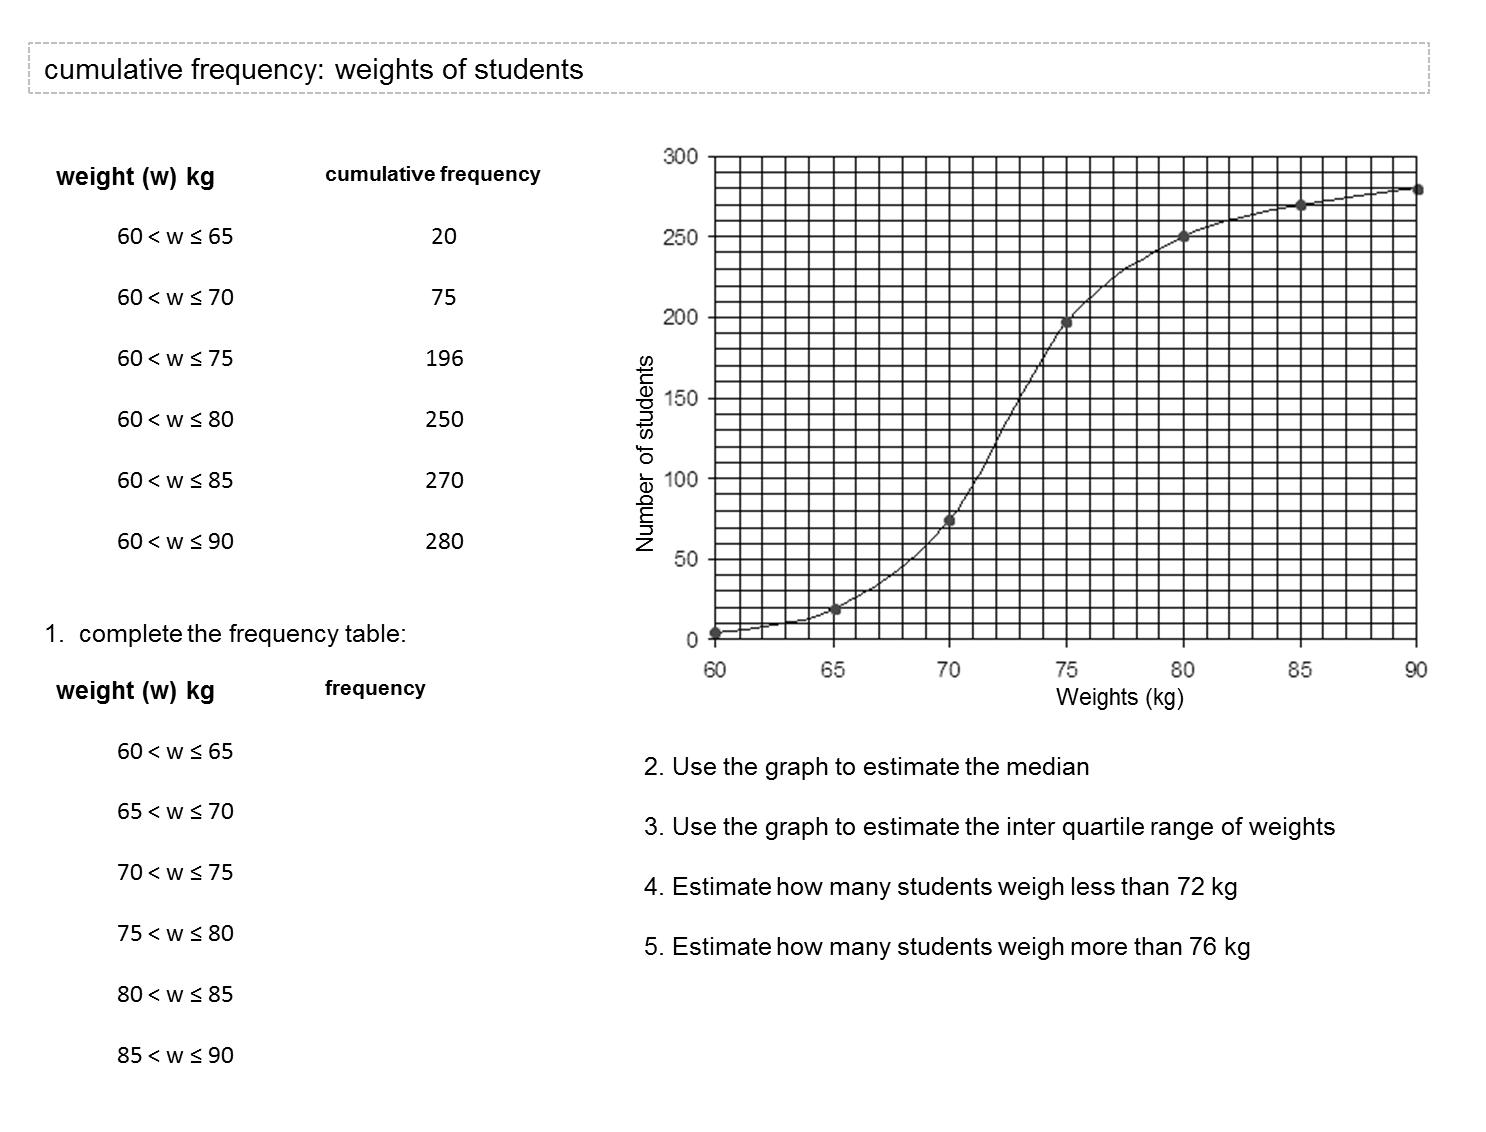 MEDIAN Don Steward mathematics teaching: cumulative frequency questions